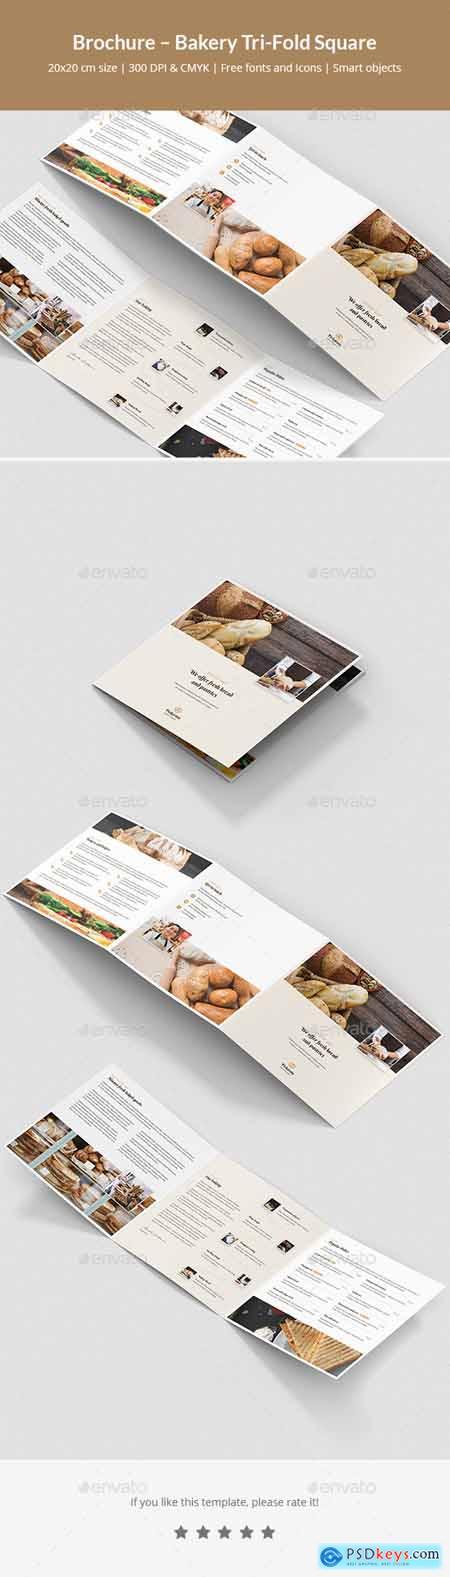 Brochure – Bakery Tri-Fold Square 24507297